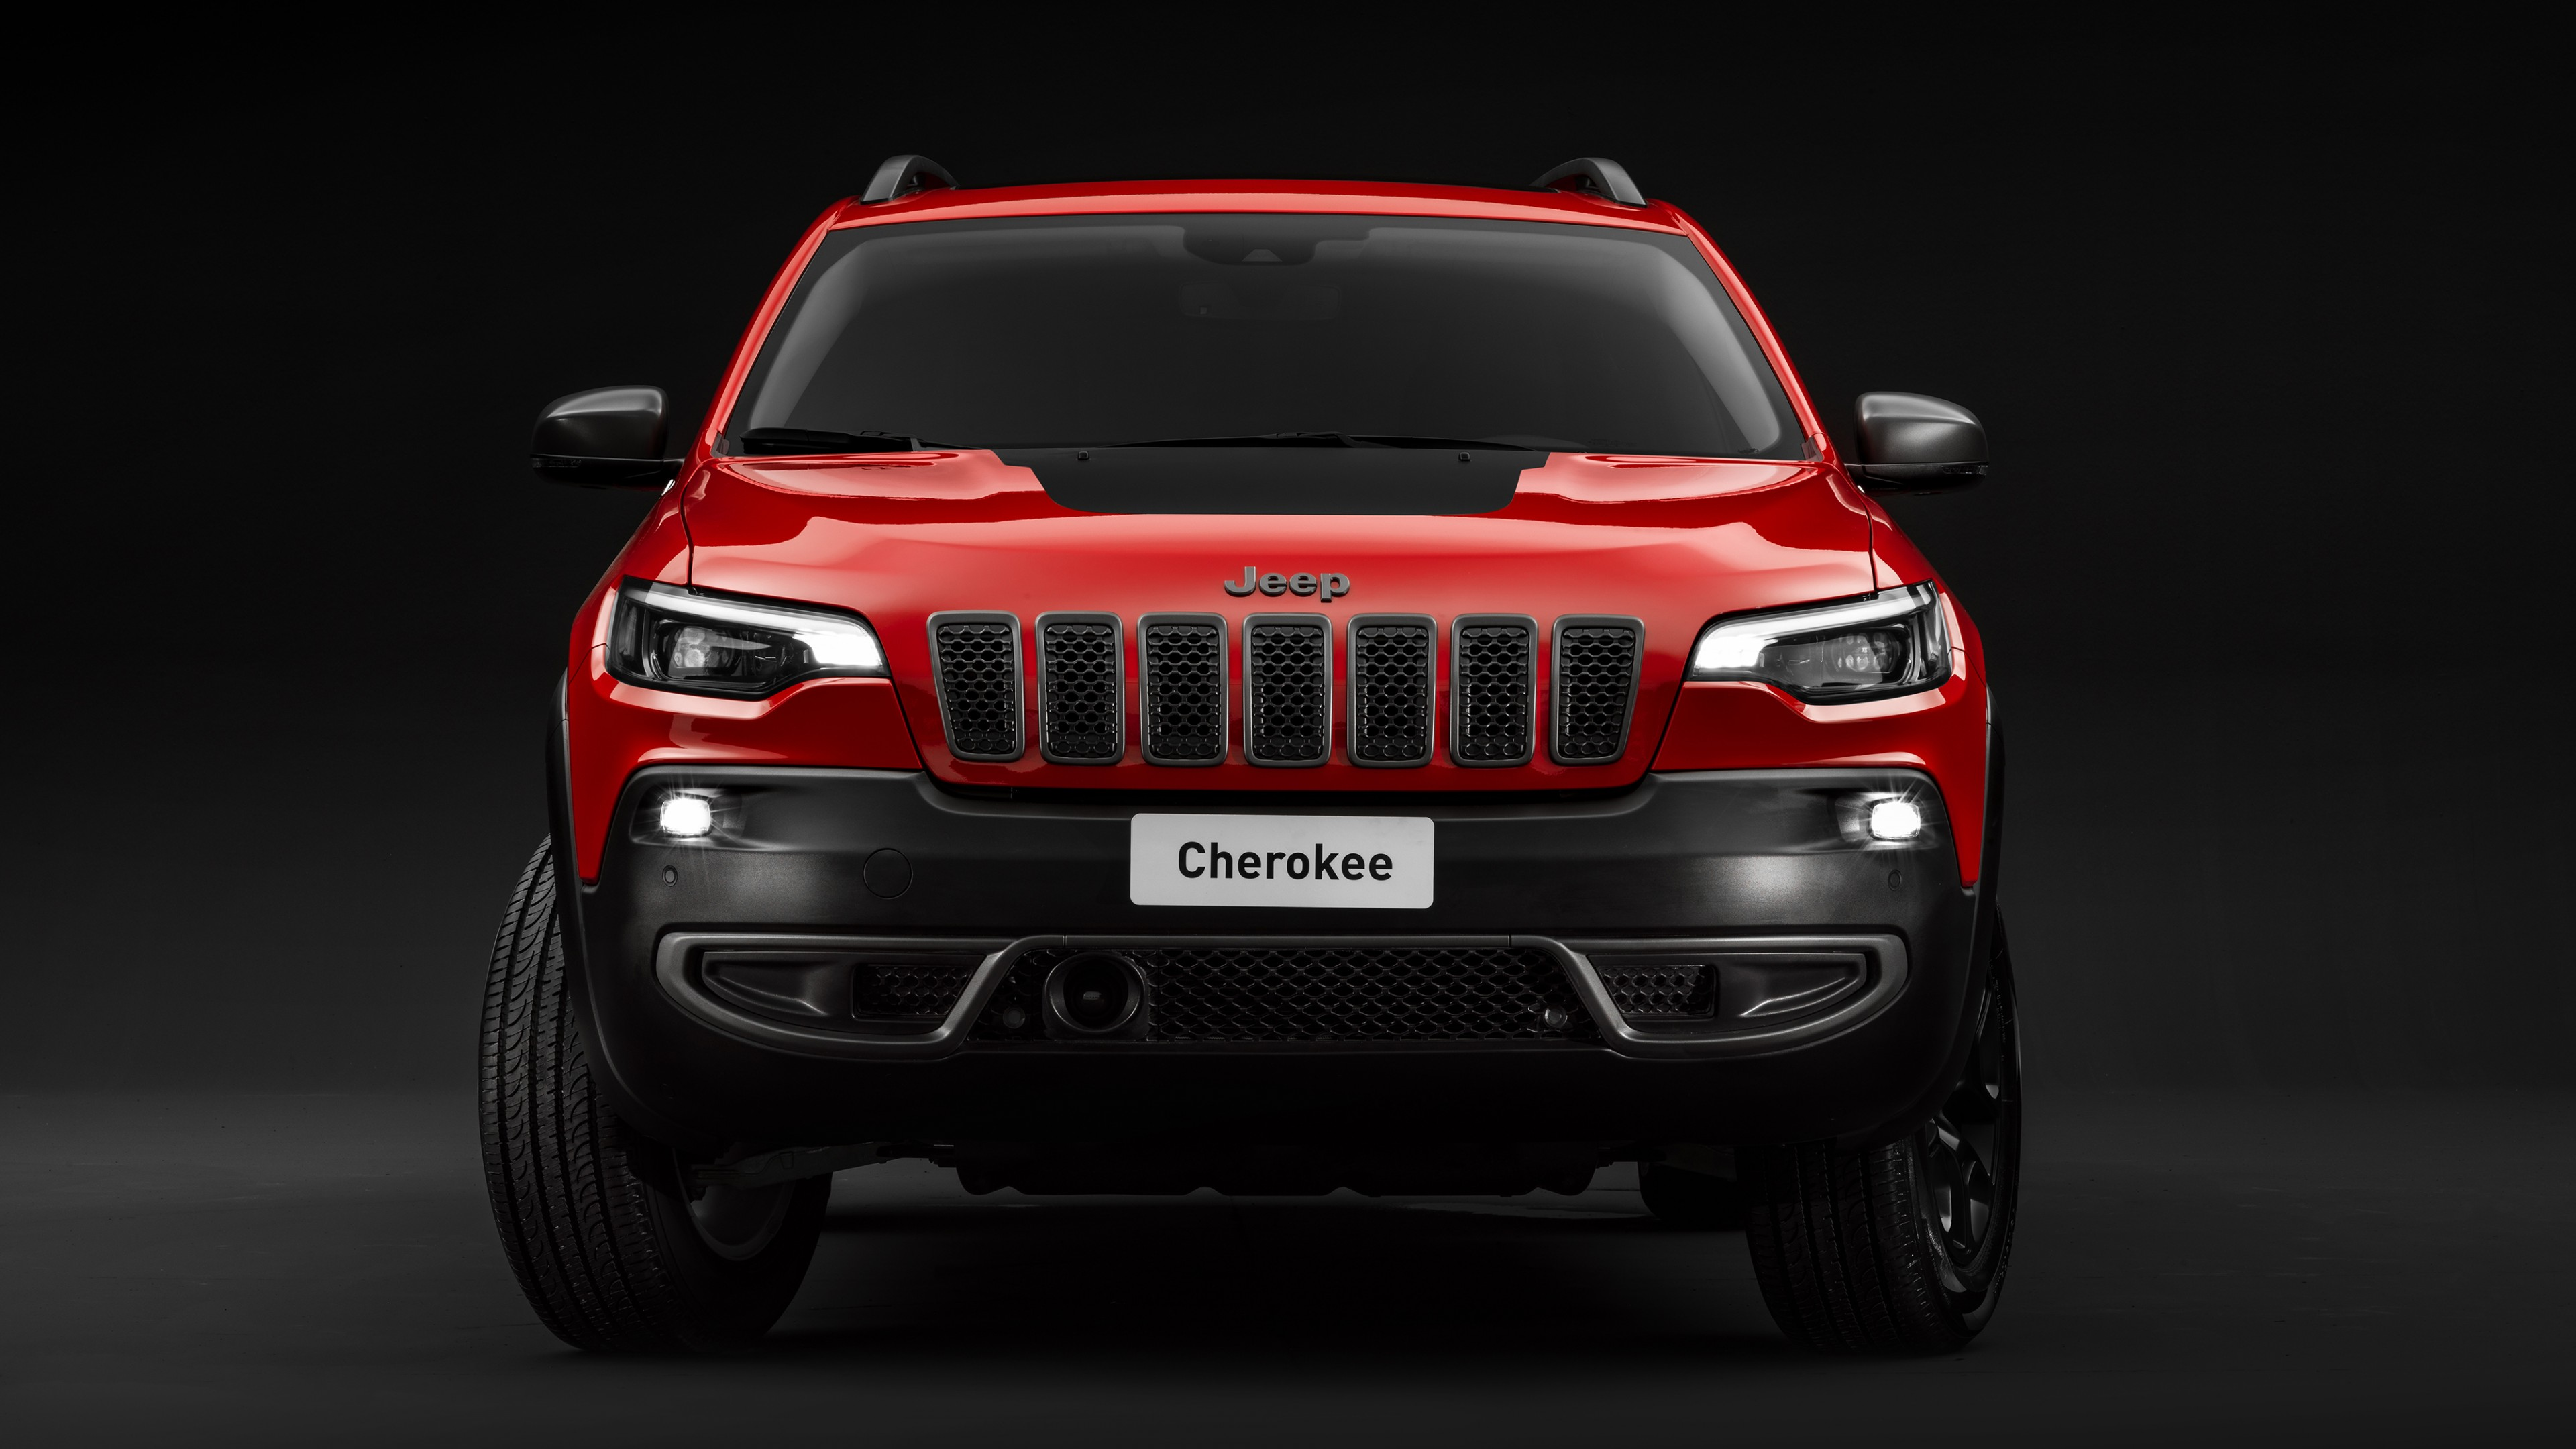 Jeep Cherokee Trailhawk 2019 4K Wallpaper   HD Car ...